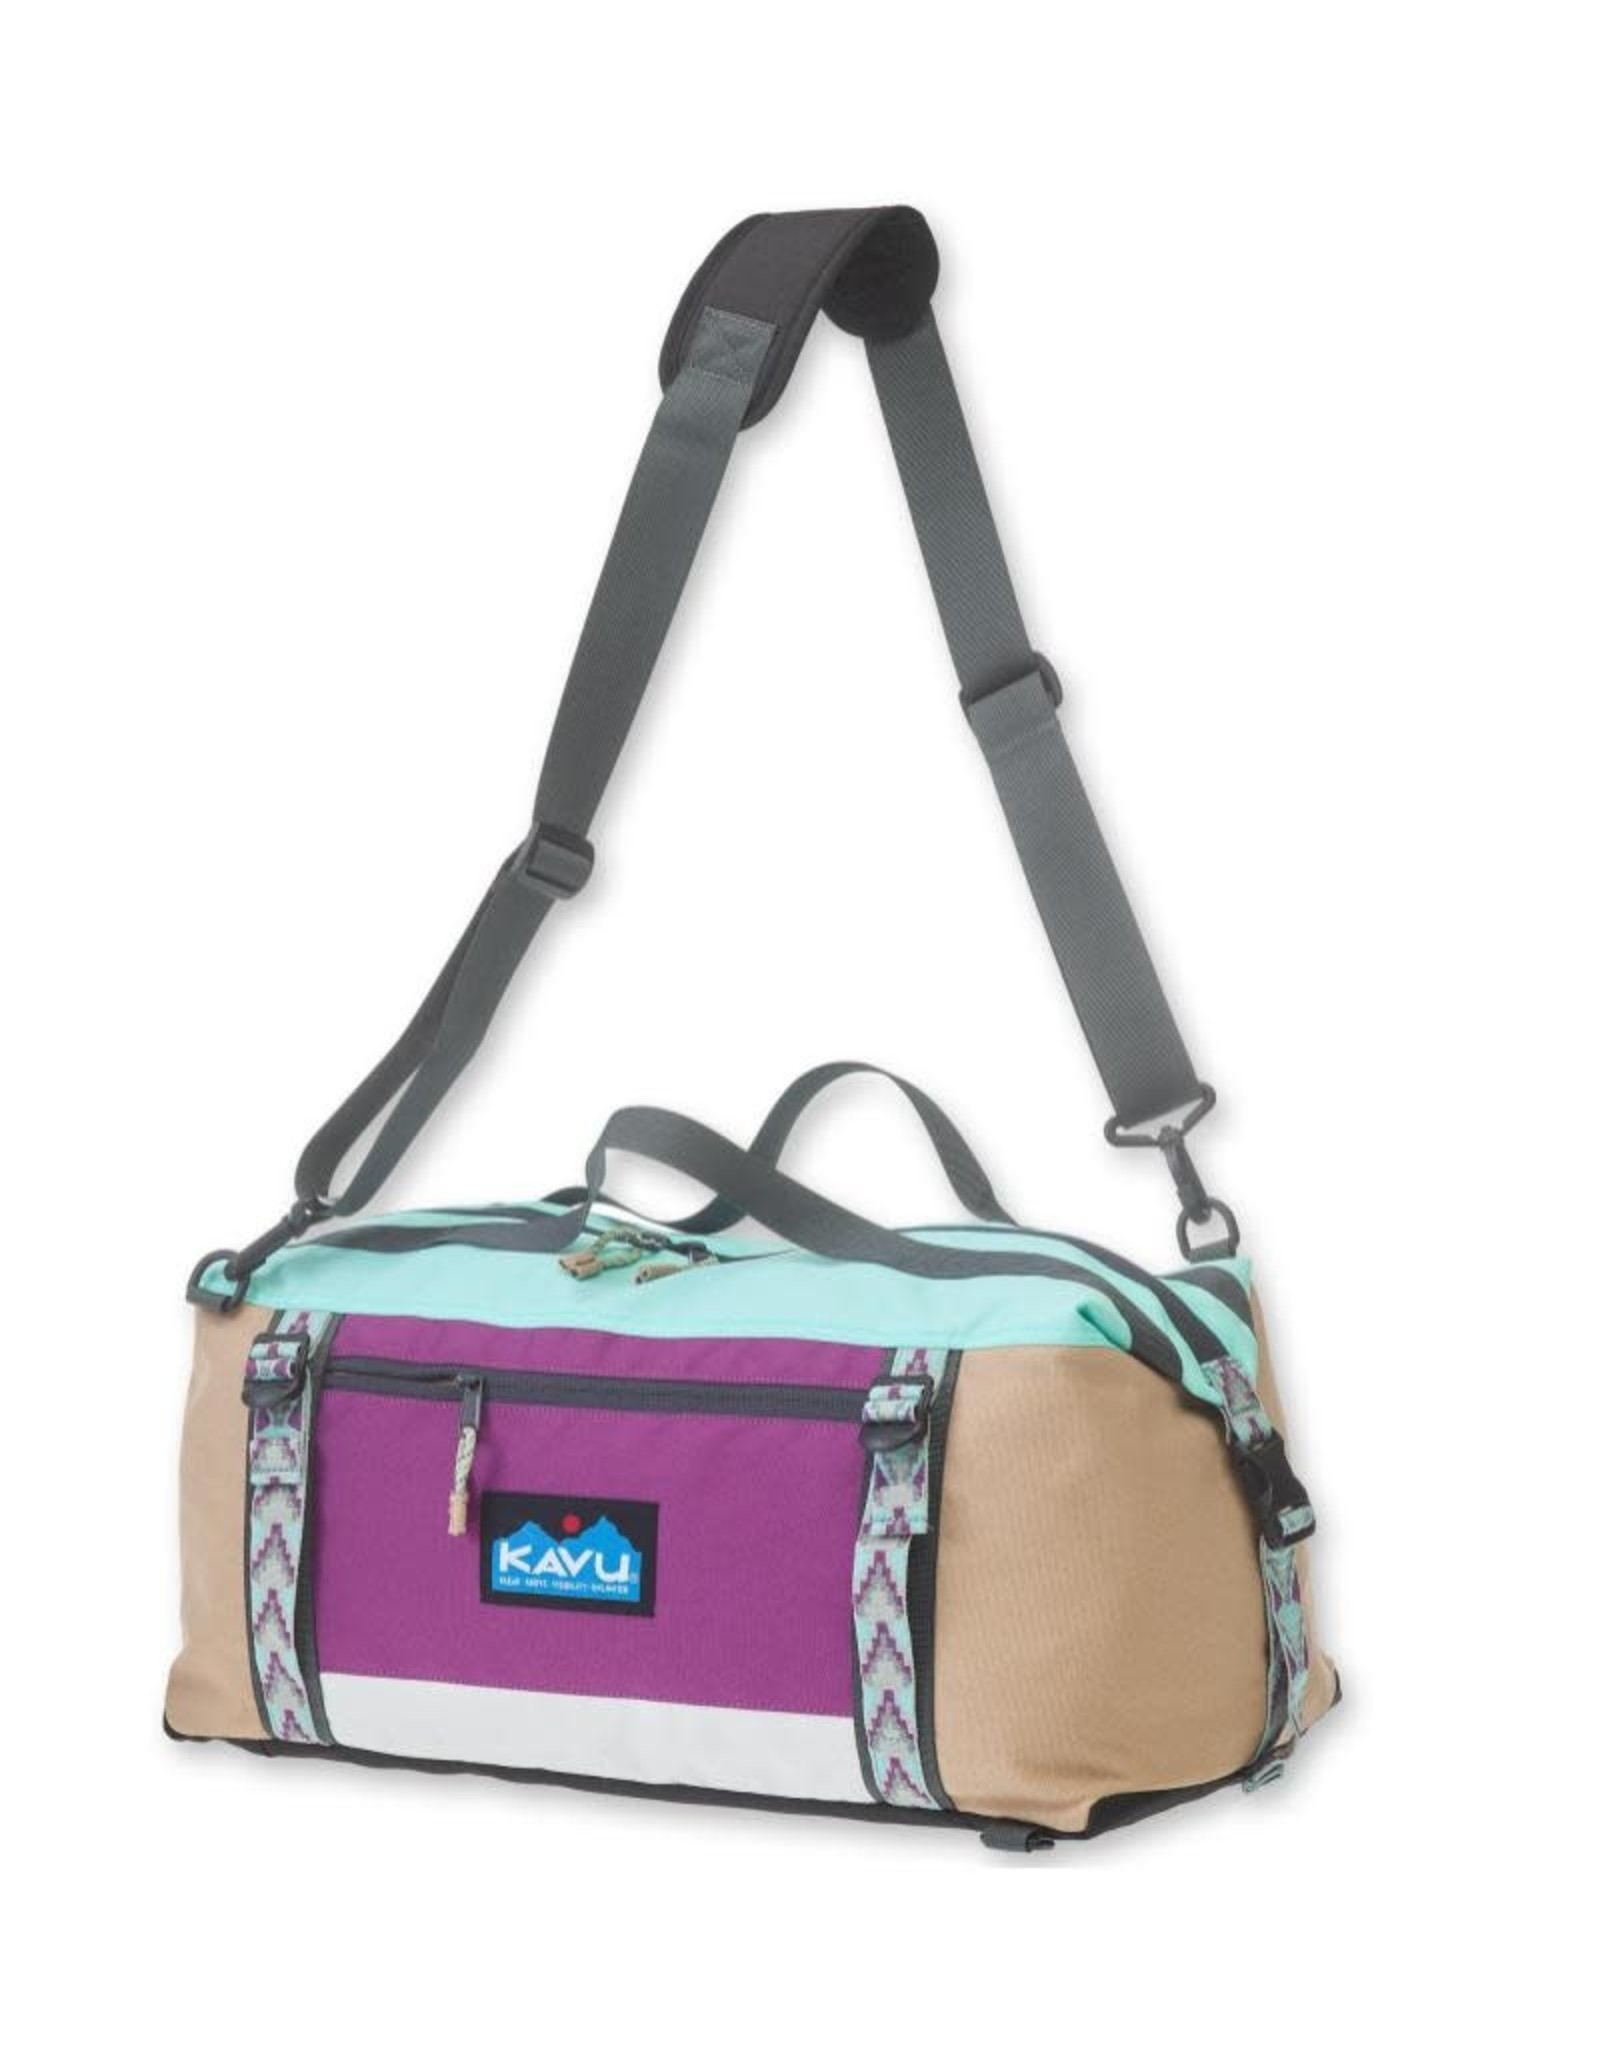 KAVU Little Feller Backpack Duffle